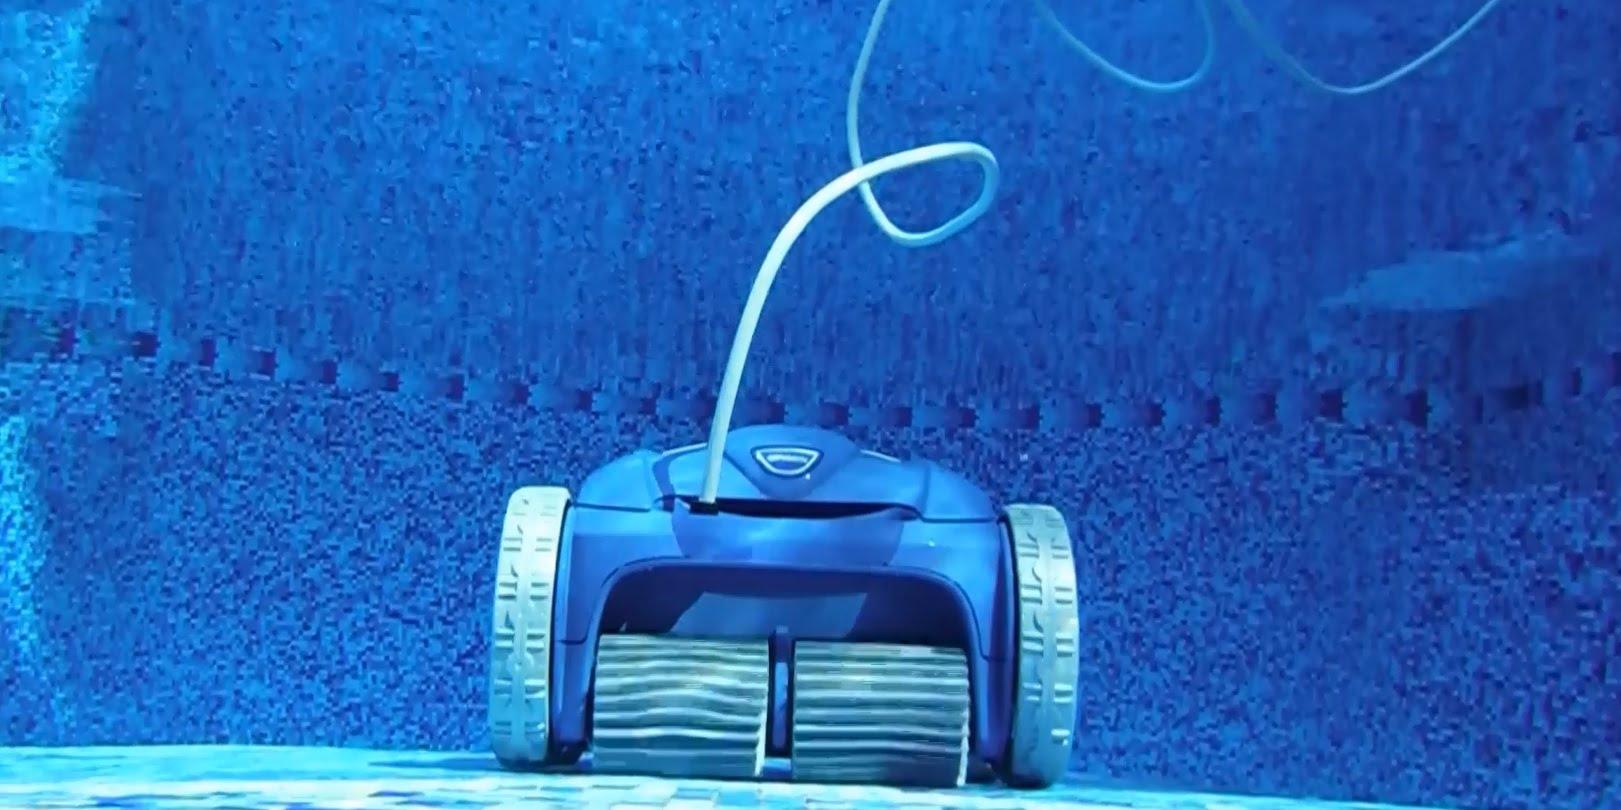 Polaris 9550 Robotic Pool Cleaner Review